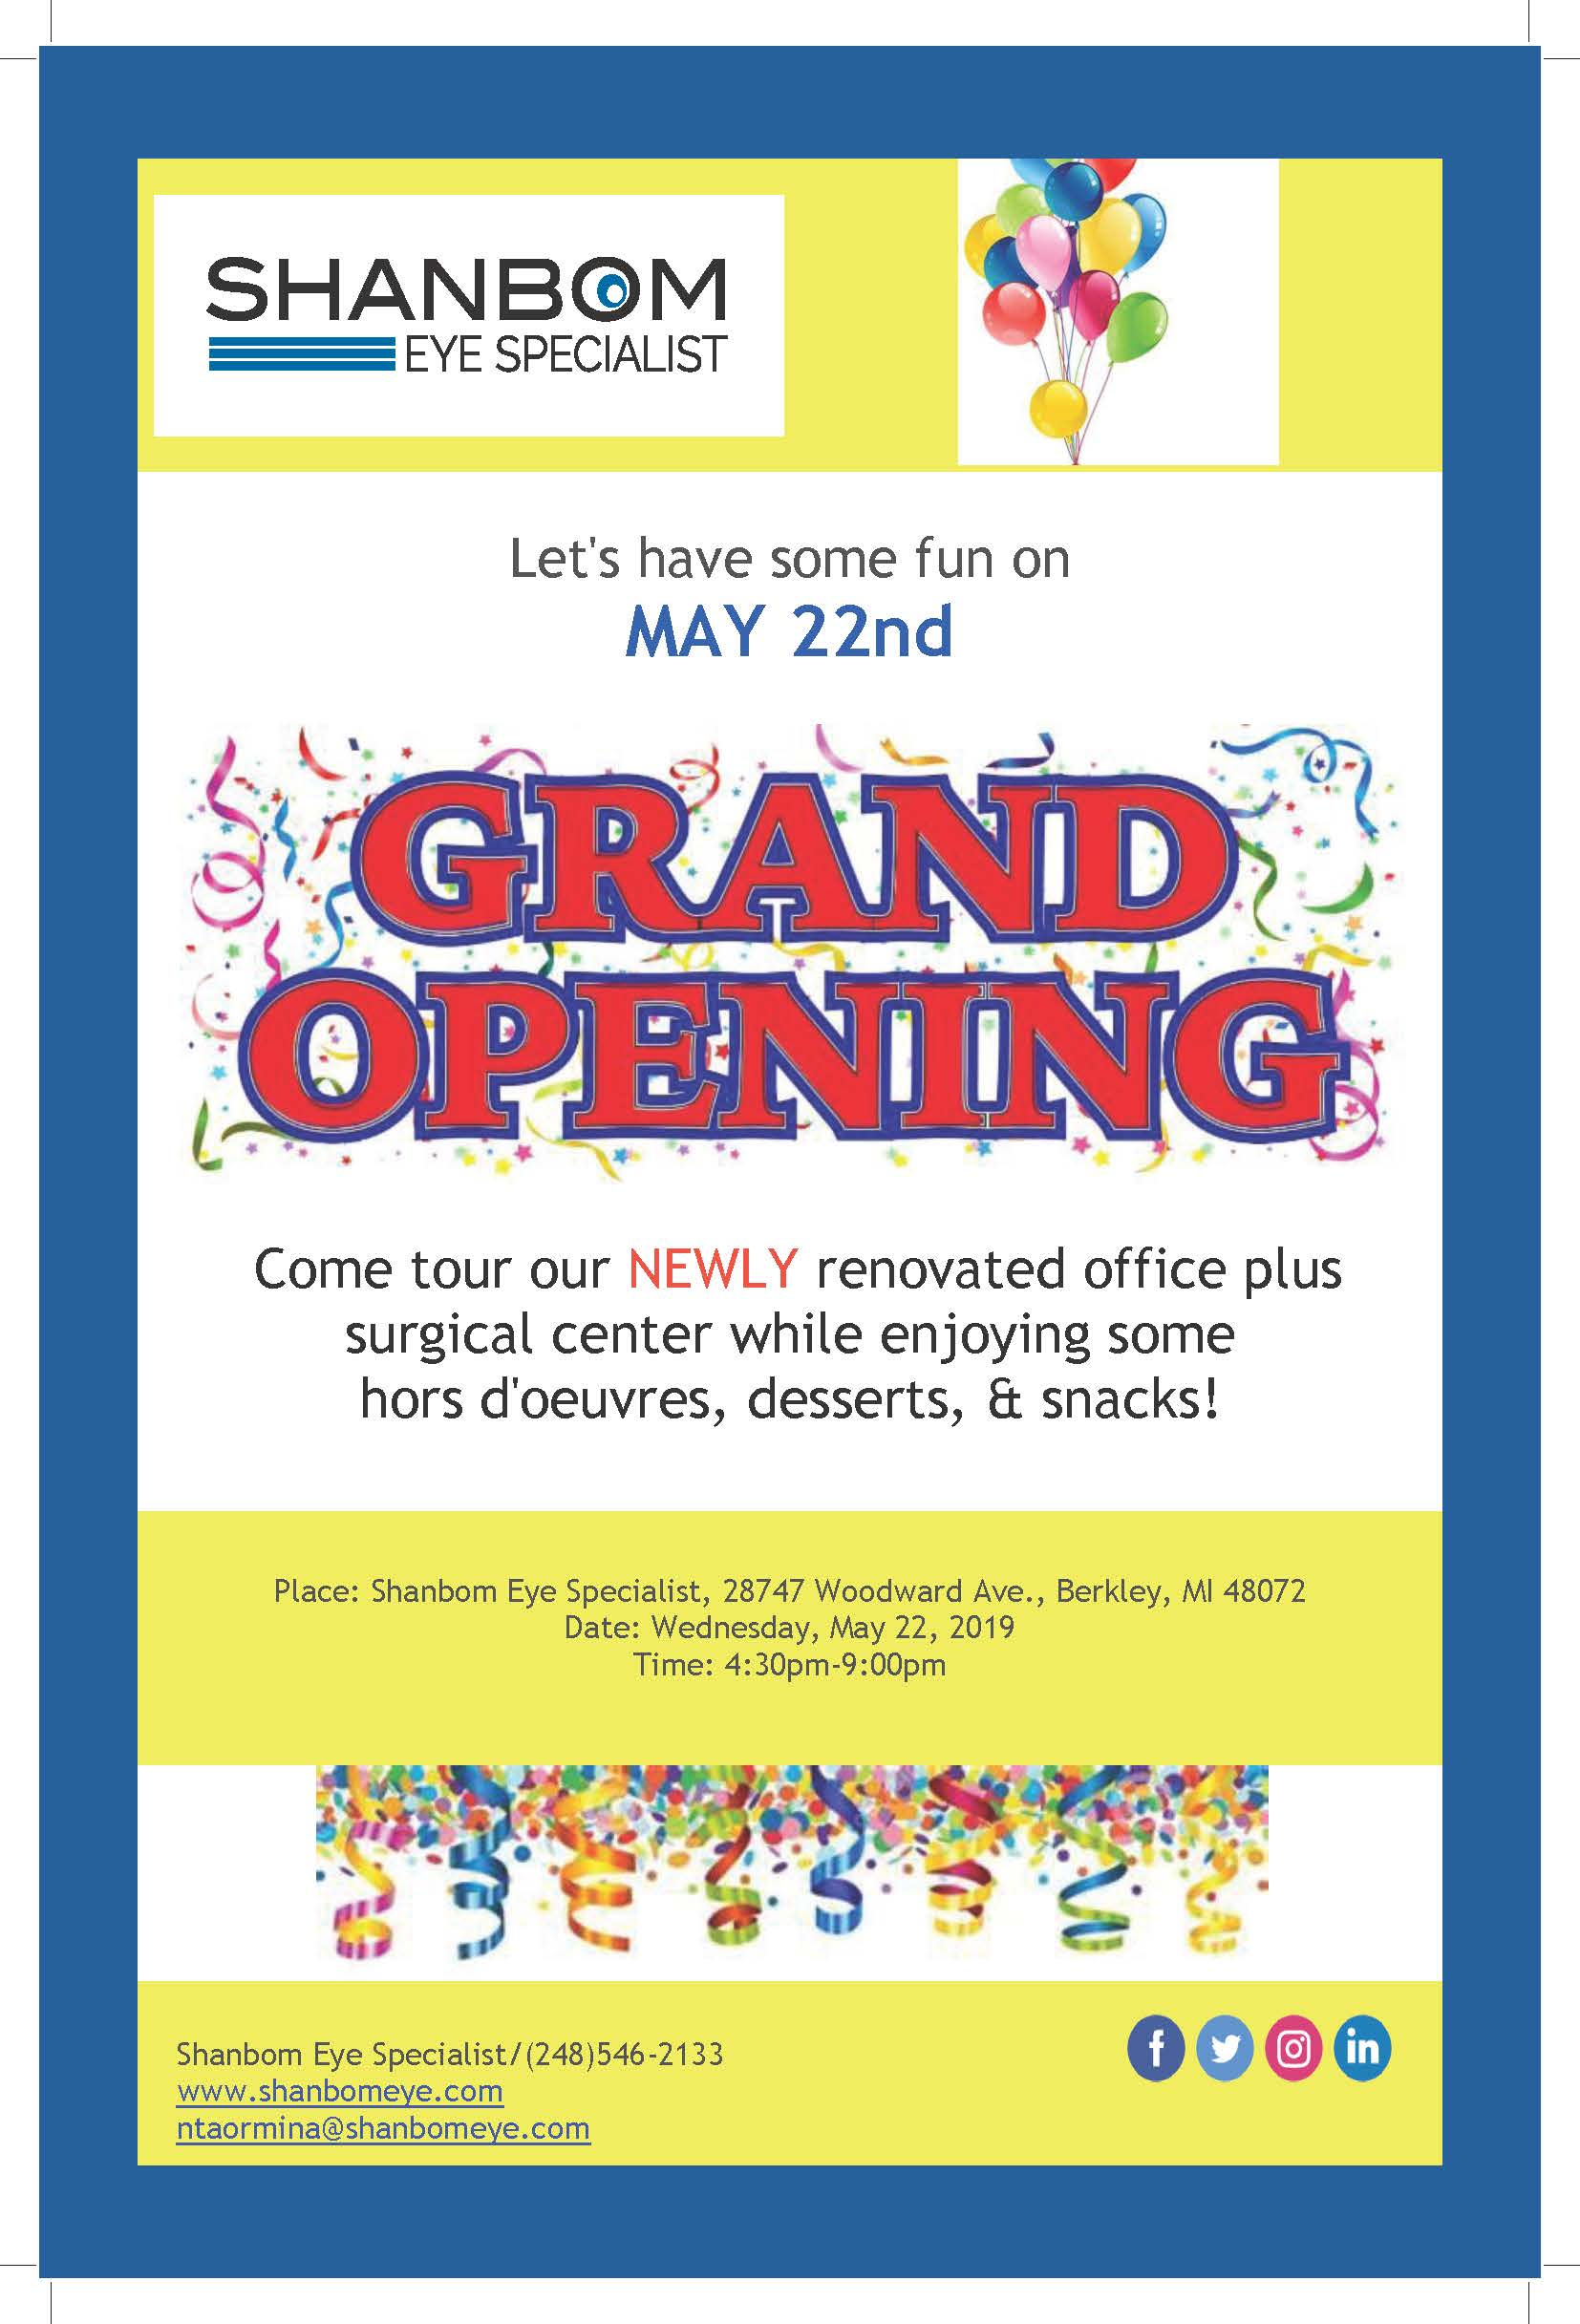 Shanbom Eye Specialist - Grand Opening